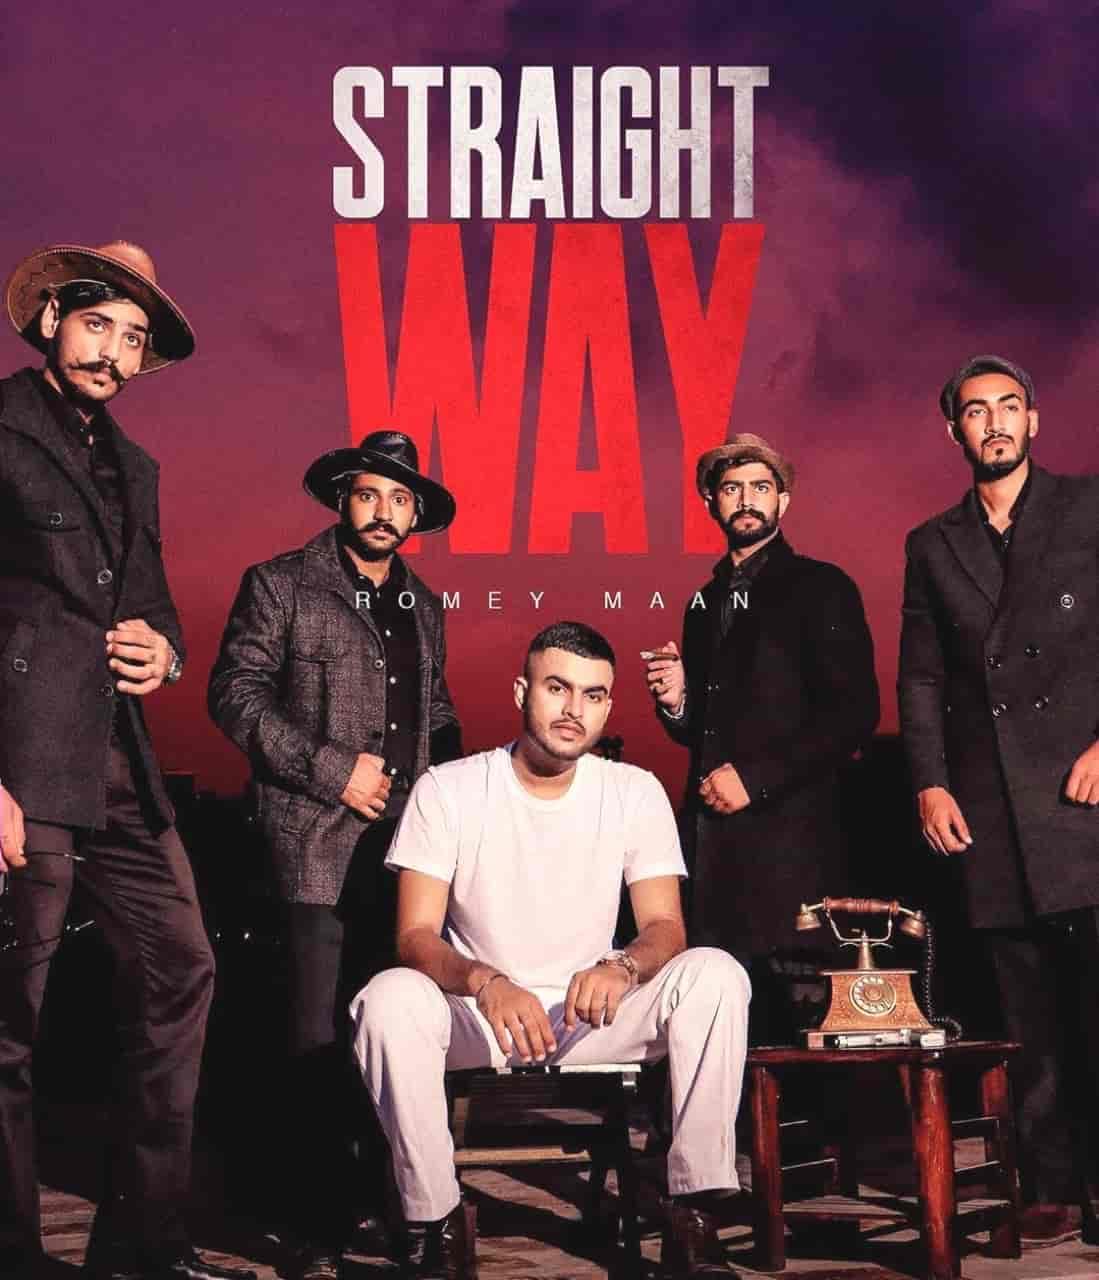 Straight Way Punjabi Song Image Features Romey Maan & Team